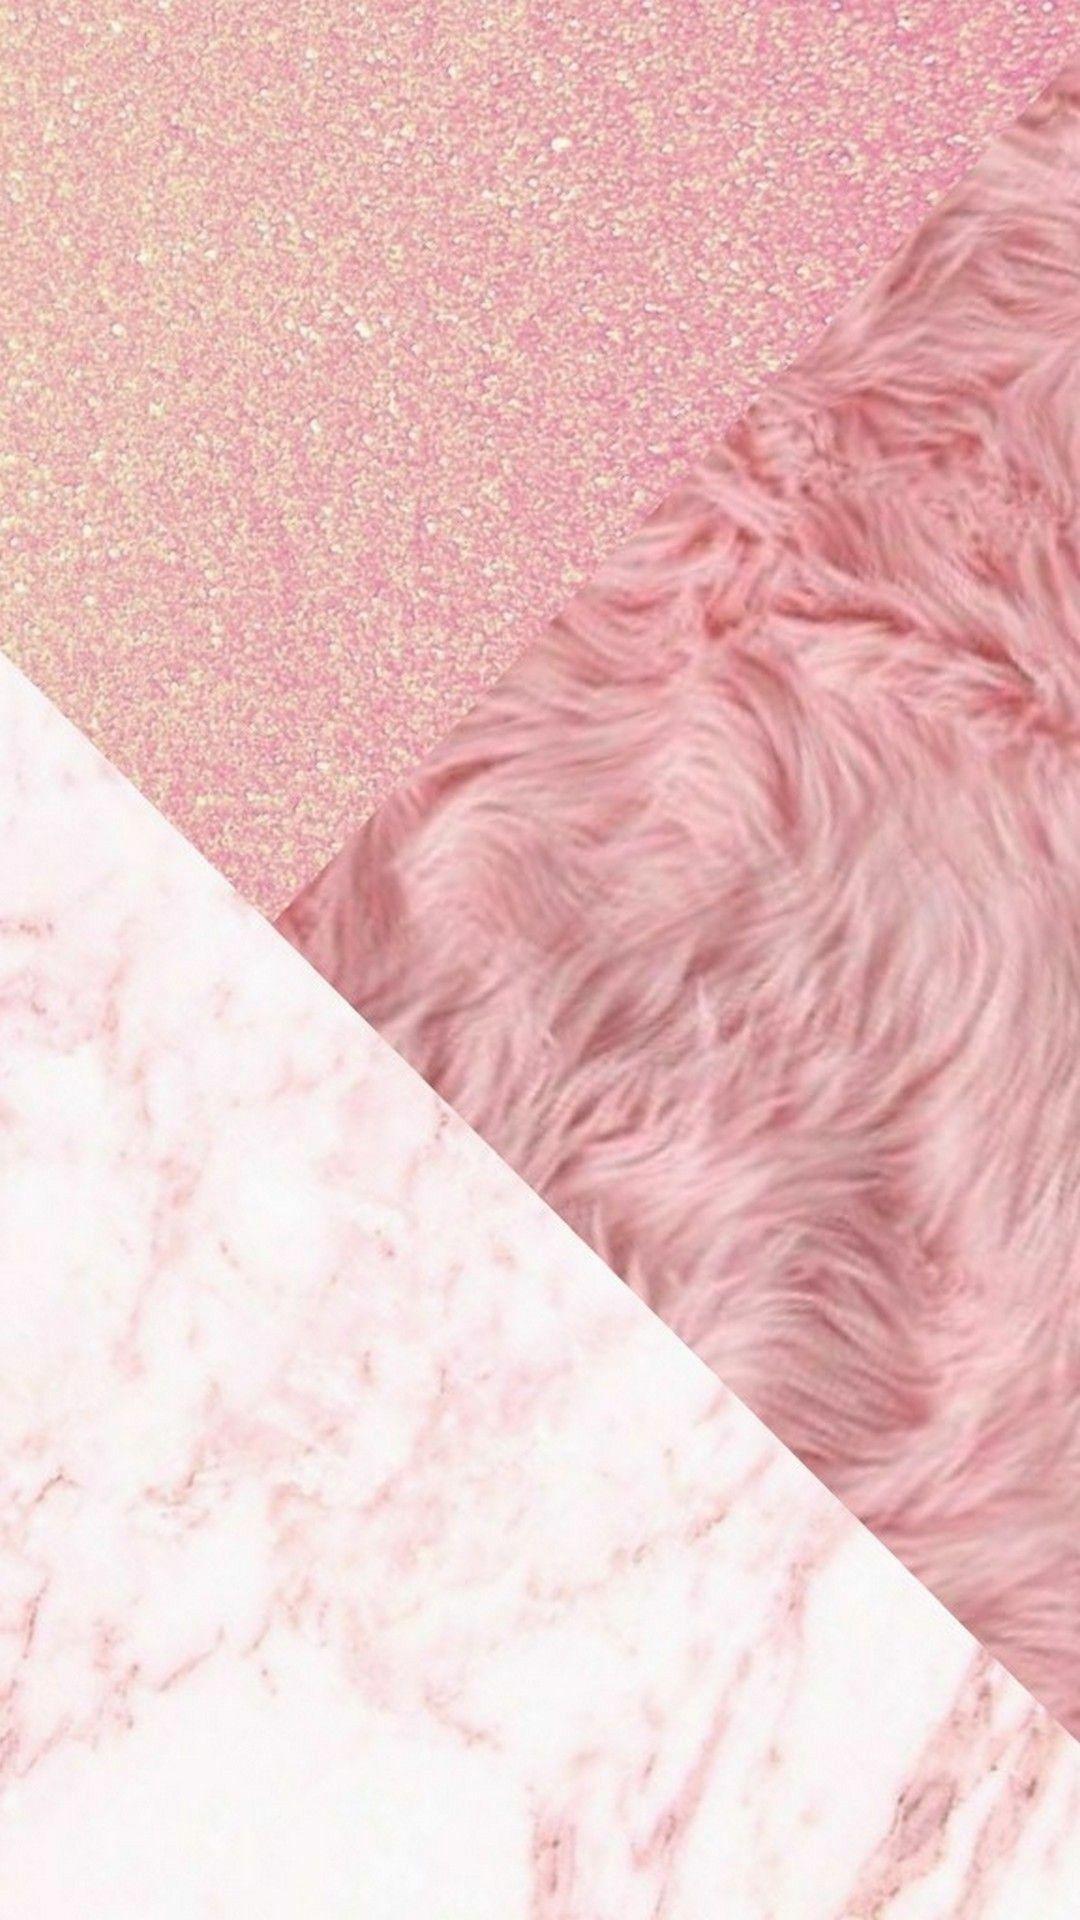 Rose Gold Aesthetic Iphone Tumblr Wallpaper